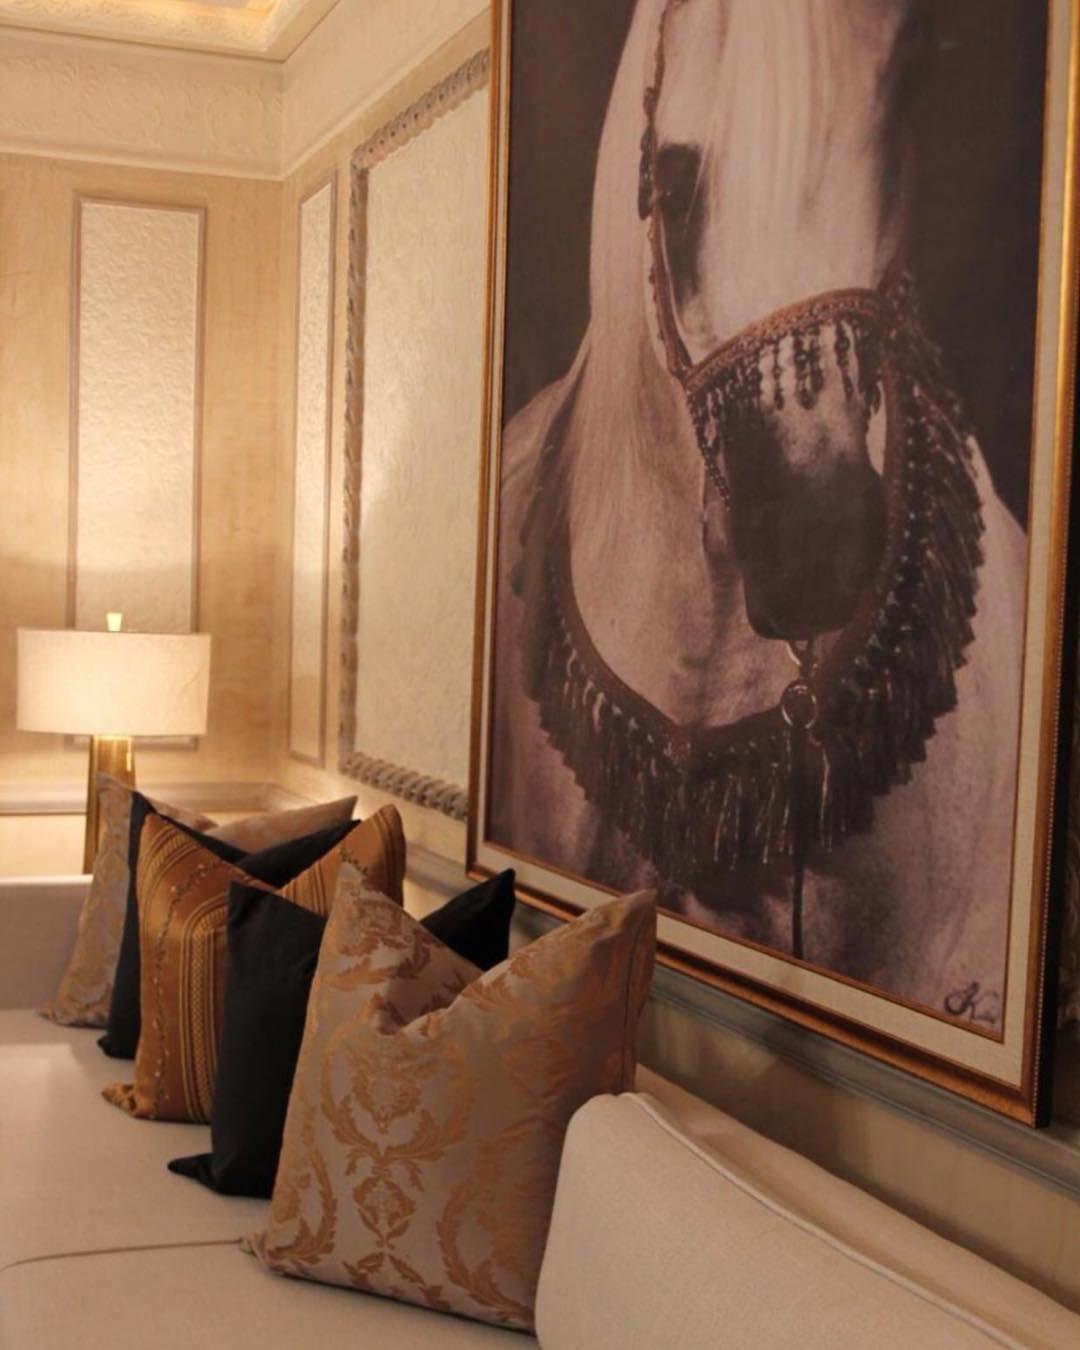 New The 10 Best Home Decor With Pictures تصميم ديكور جوتن حدائق واجهات منزل دهان ابواب مداخل Design Interior Decorating Decor Interior Design